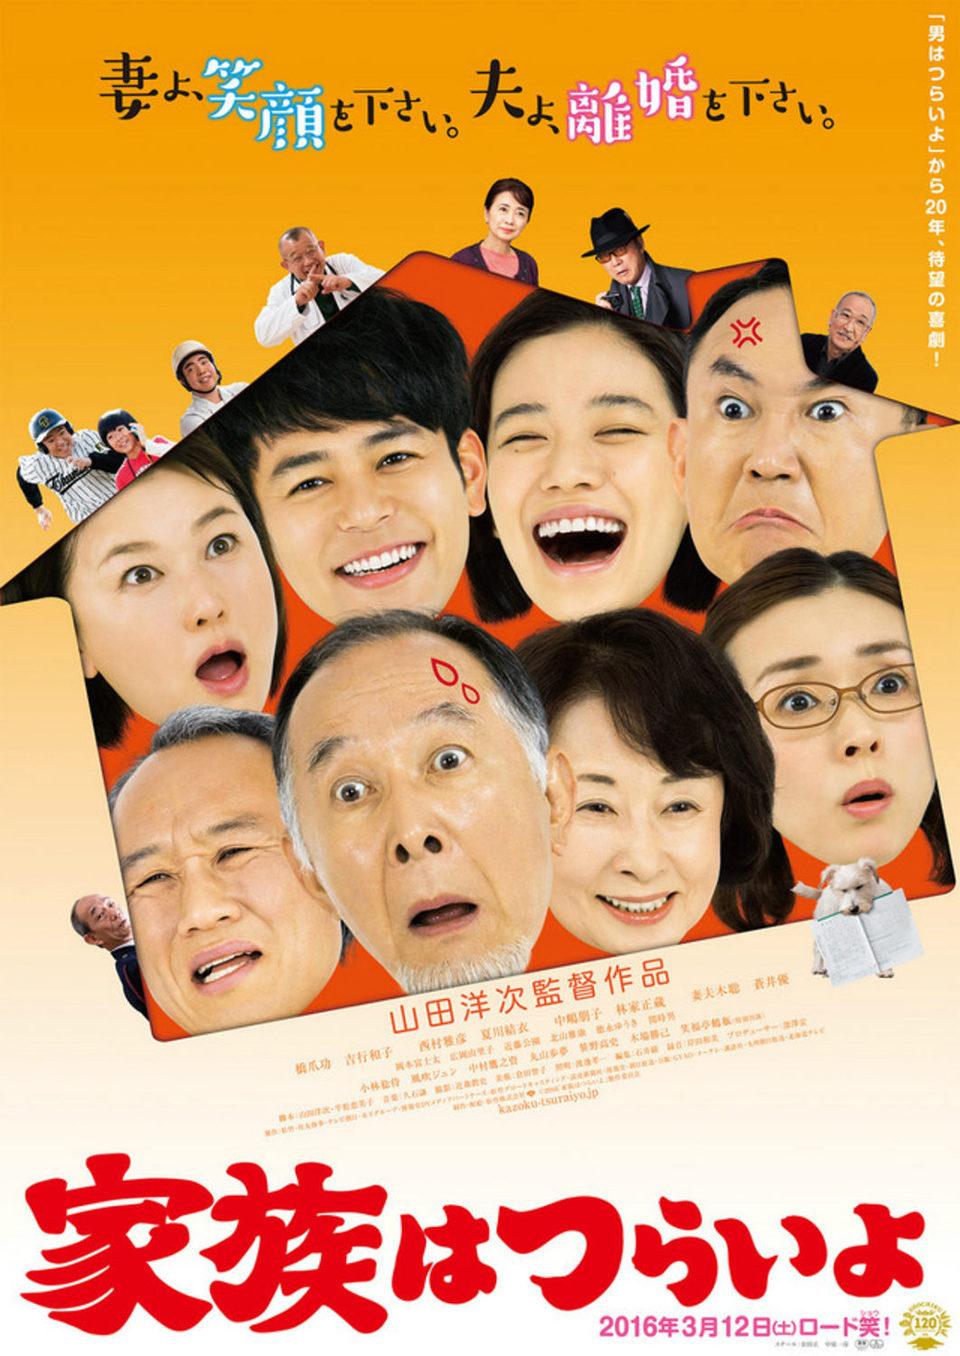 Cartel Japón de 'Maravillosa familia de Tokio'